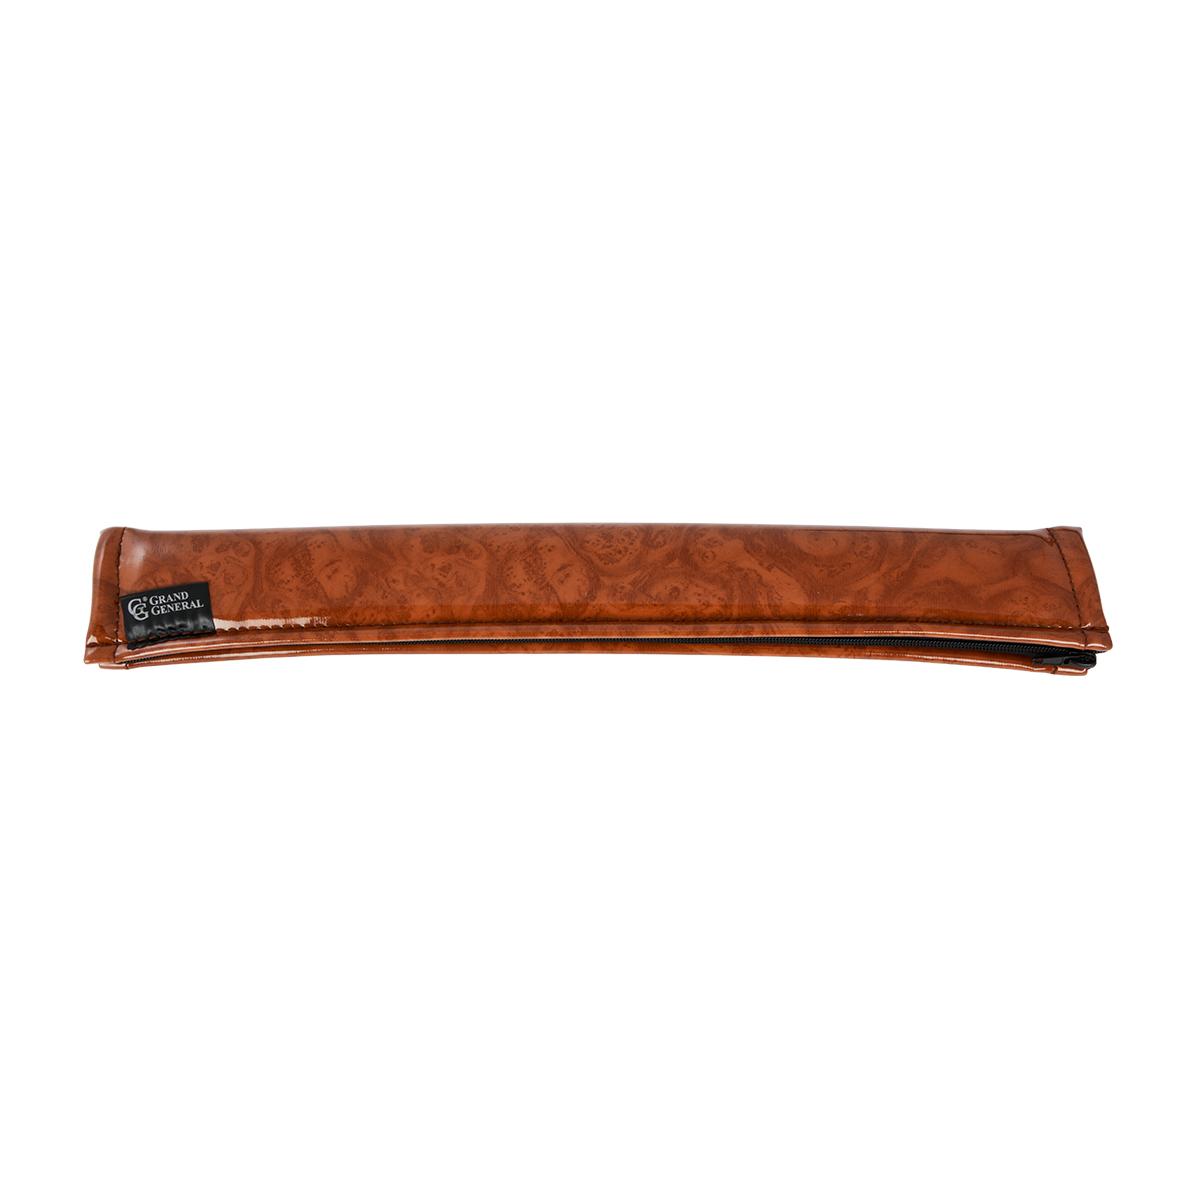 "17"" Light Wood Gear Shift Stick Cover for Peterbilt Kenworth Freightliner"